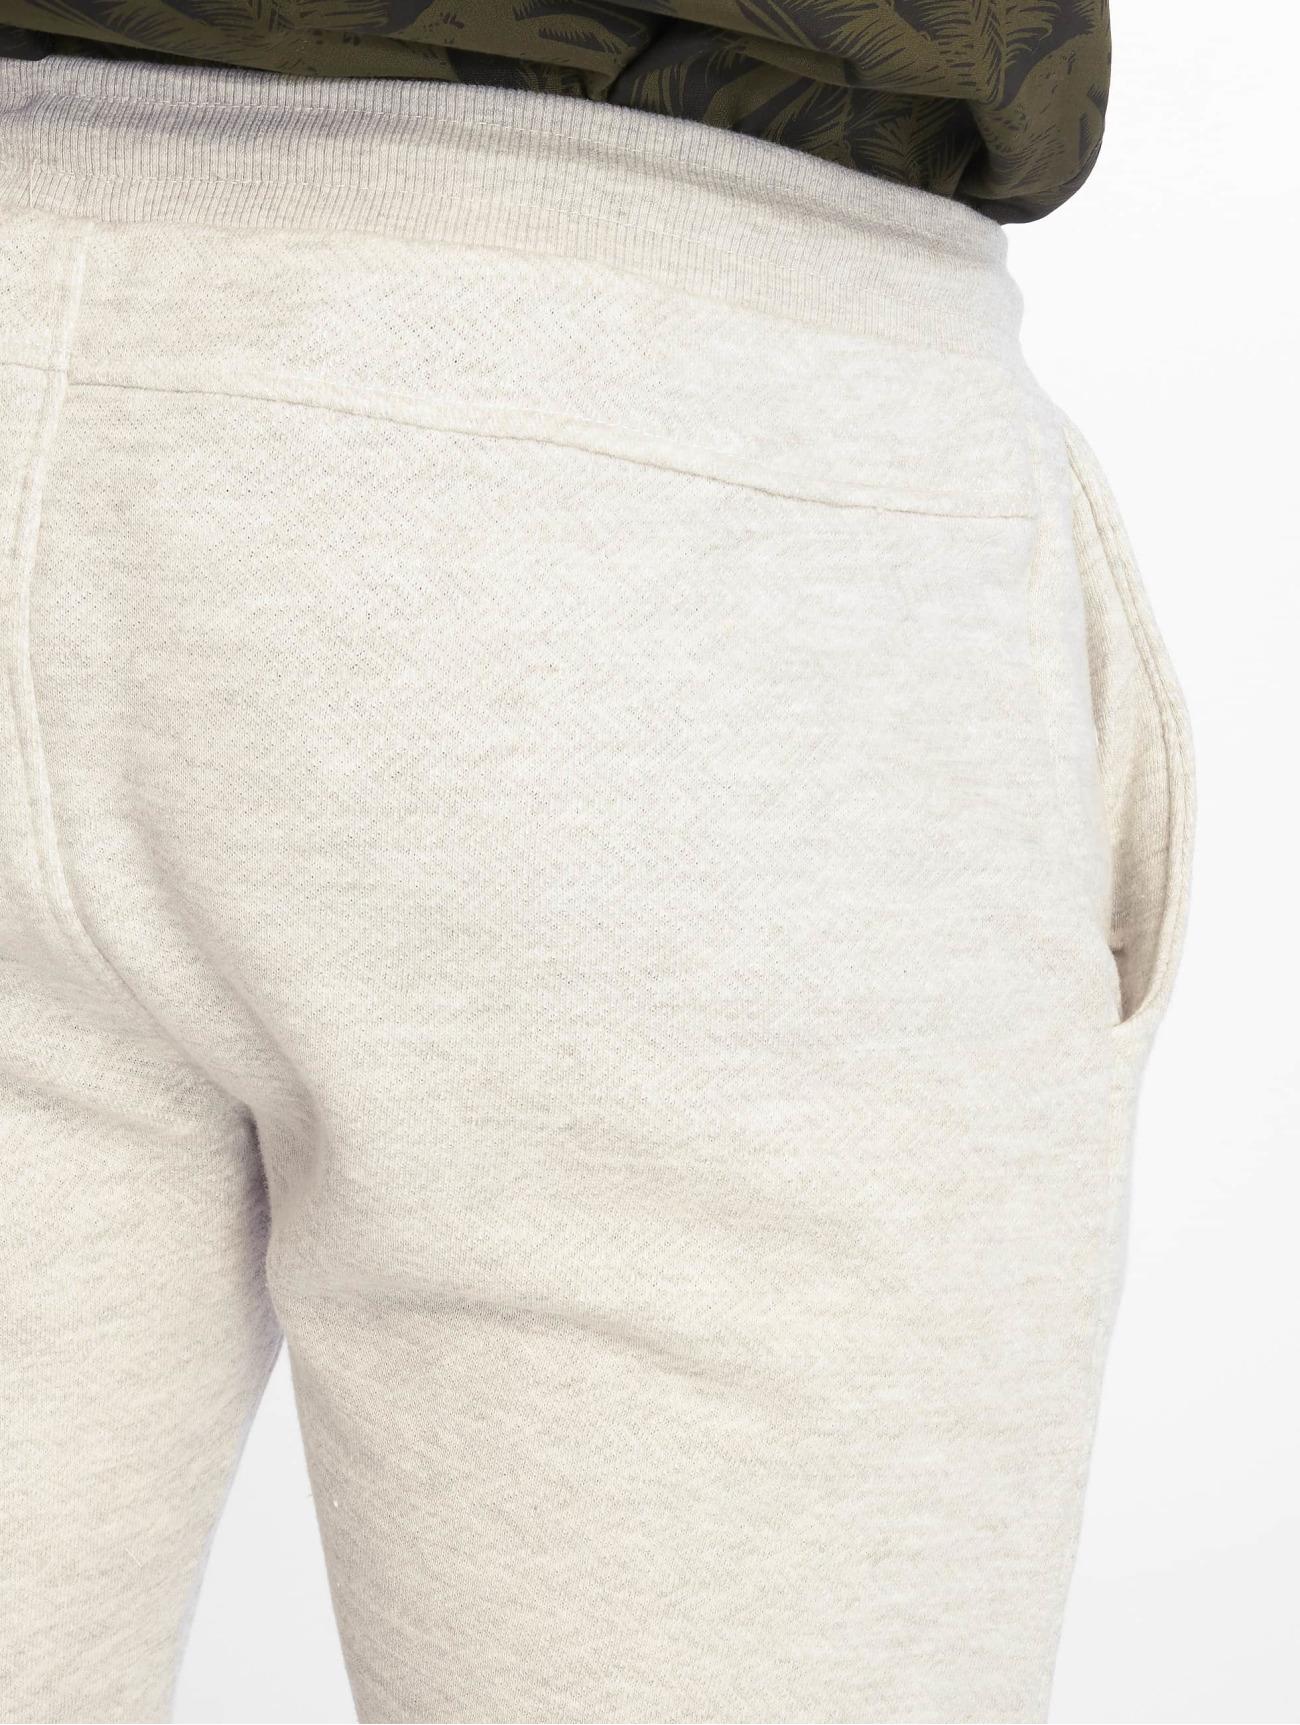 Urban Classics  Herringbone Terry  gris Homme Short  636151 Homme Pantalons & Shorts